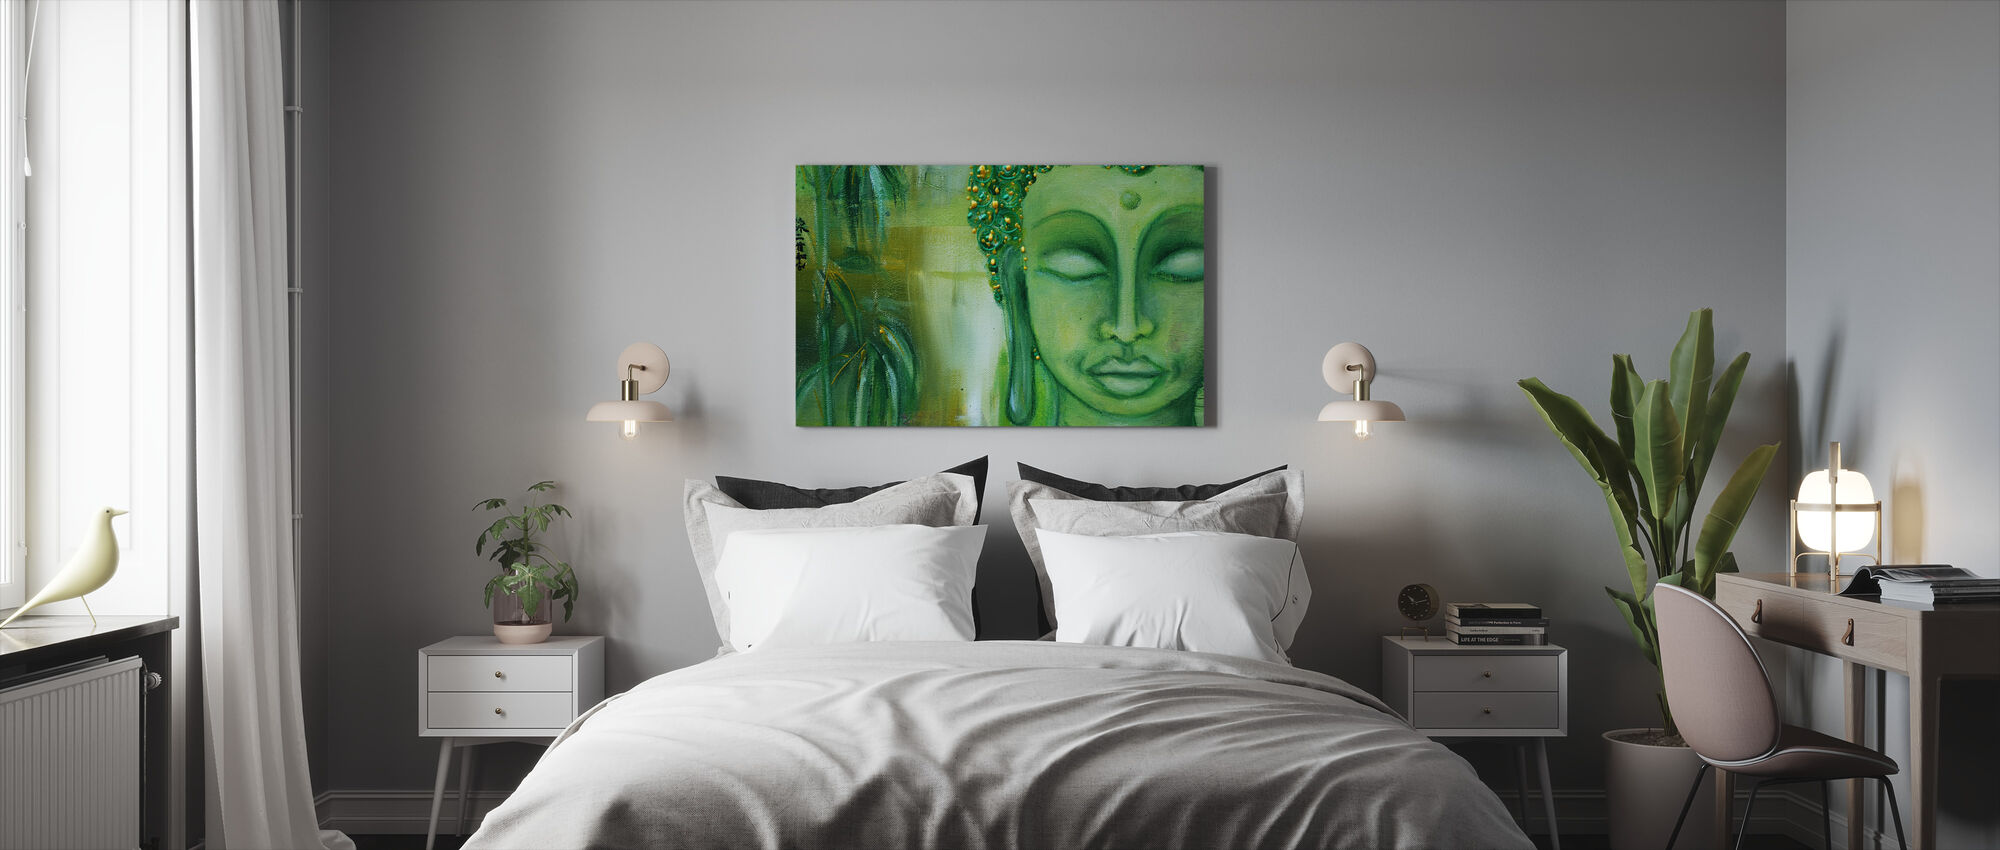 Buddha ja vihreät lehdet - Canvastaulu - Makuuhuone